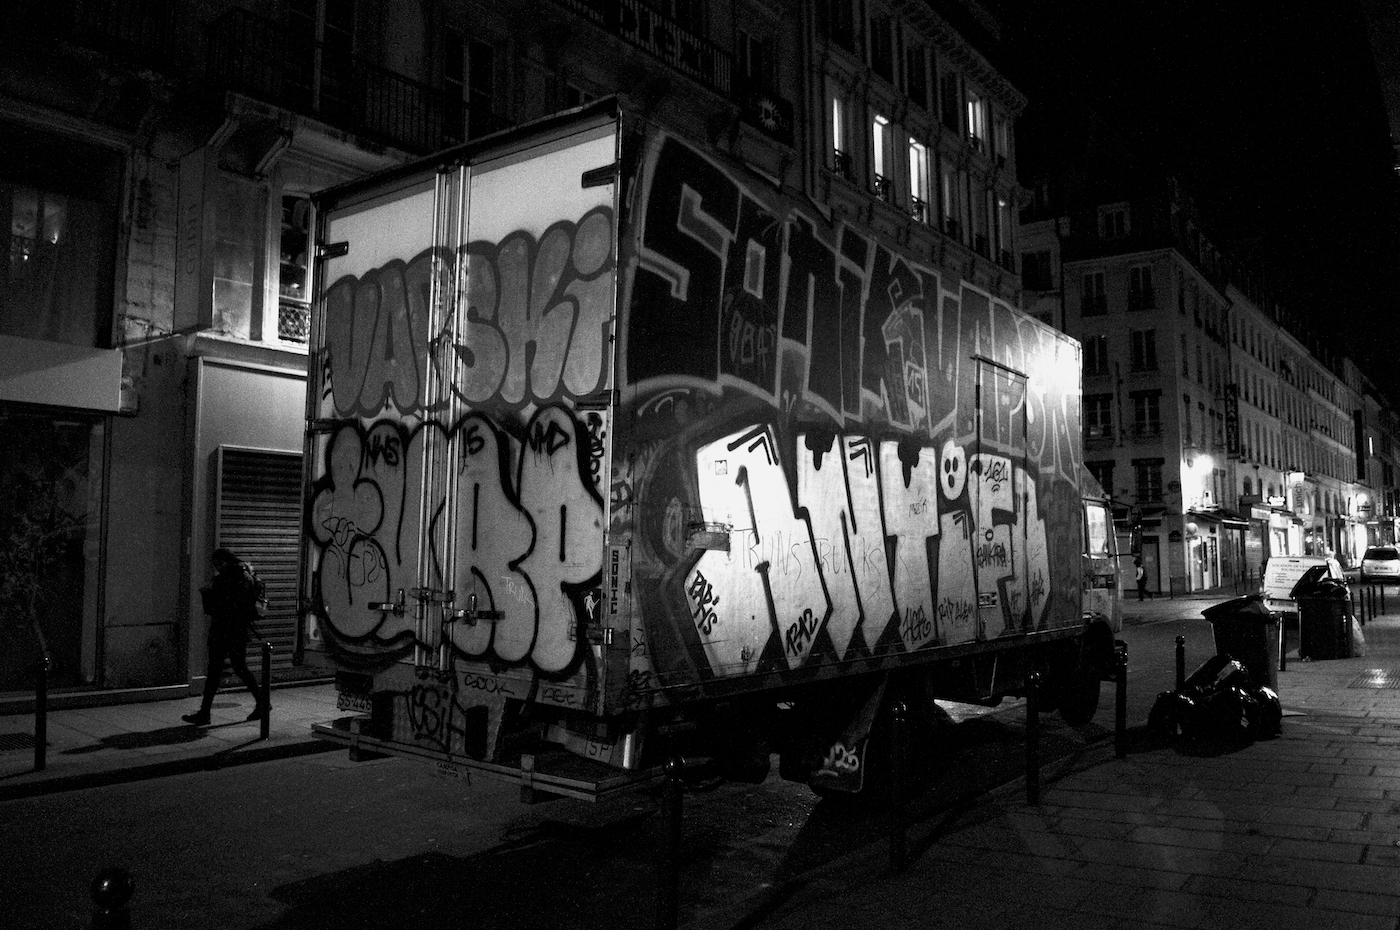 170120-marcvallee-Graffiti-Trucks-20.01.17.0017